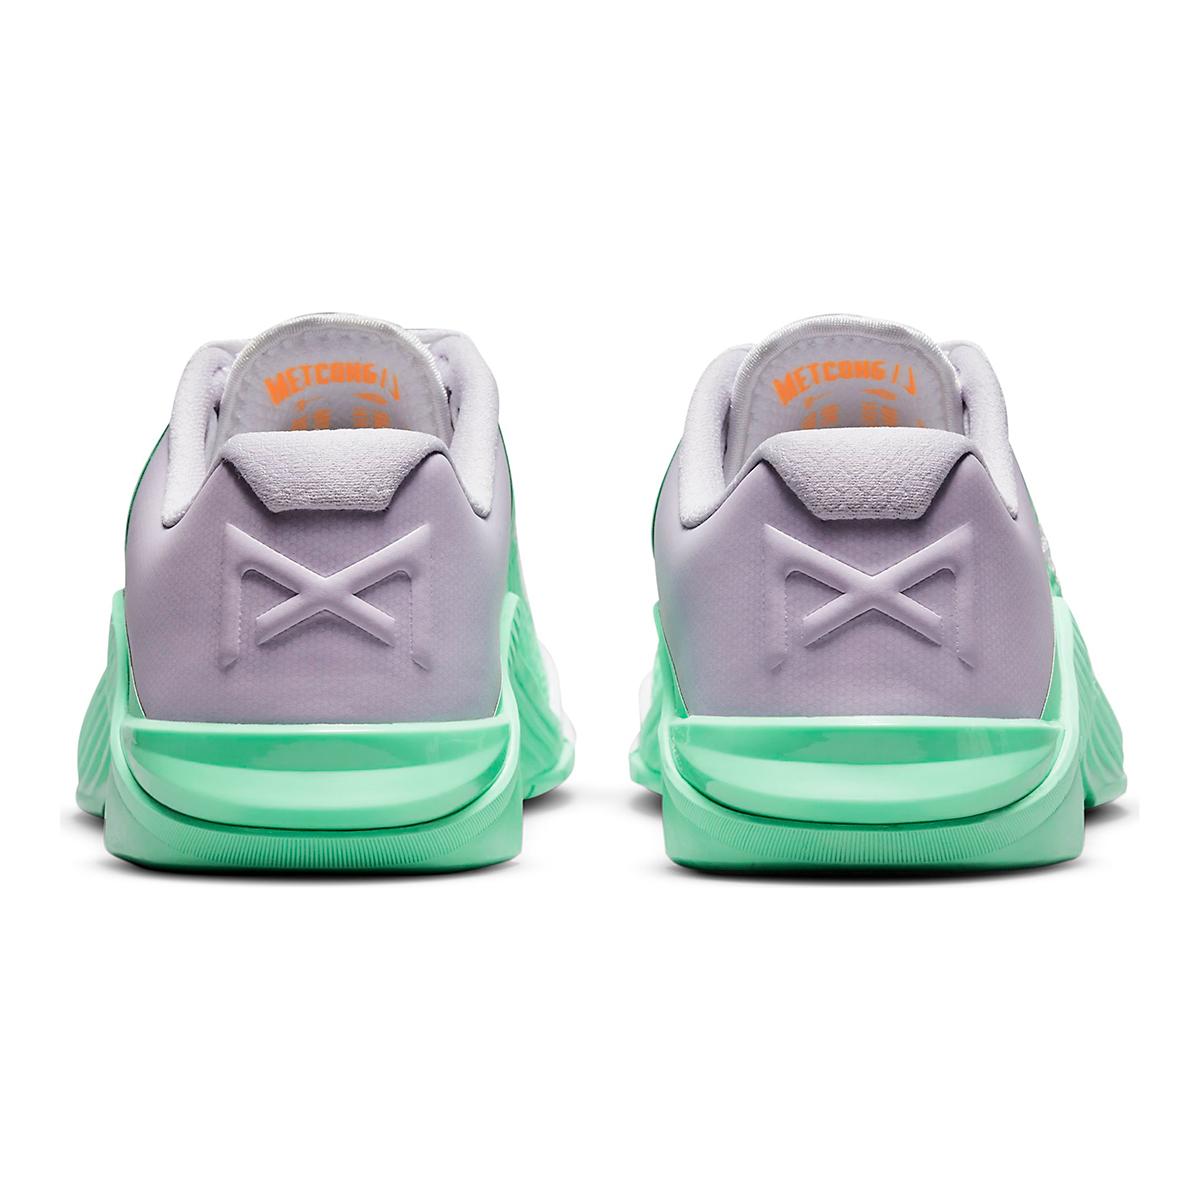 Women's Nike Metcon 6 Training Shoe - Color: White/Smoke Grey/Infinite Lilac - Size: 5 - Width: Regular, White/Smoke Grey/Infinite Lilac, large, image 5